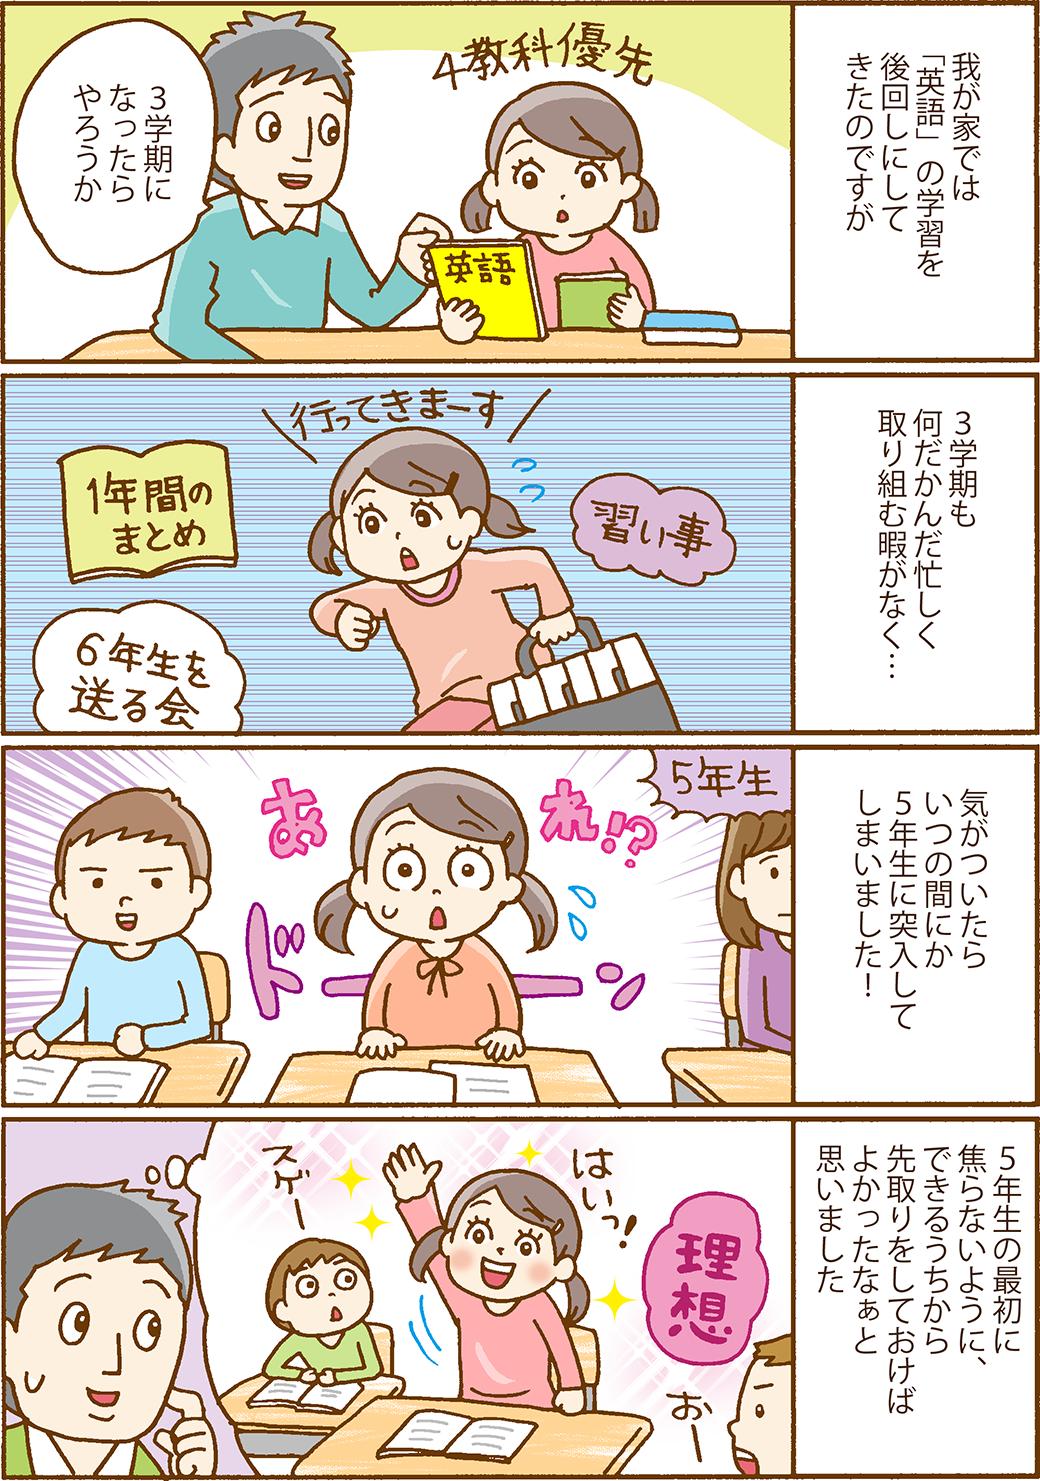 https://blog.benesse.ne.jp/zemihogo/sho/706e00a3bba1bcd36b6654f066b69e4495db6c1d.png